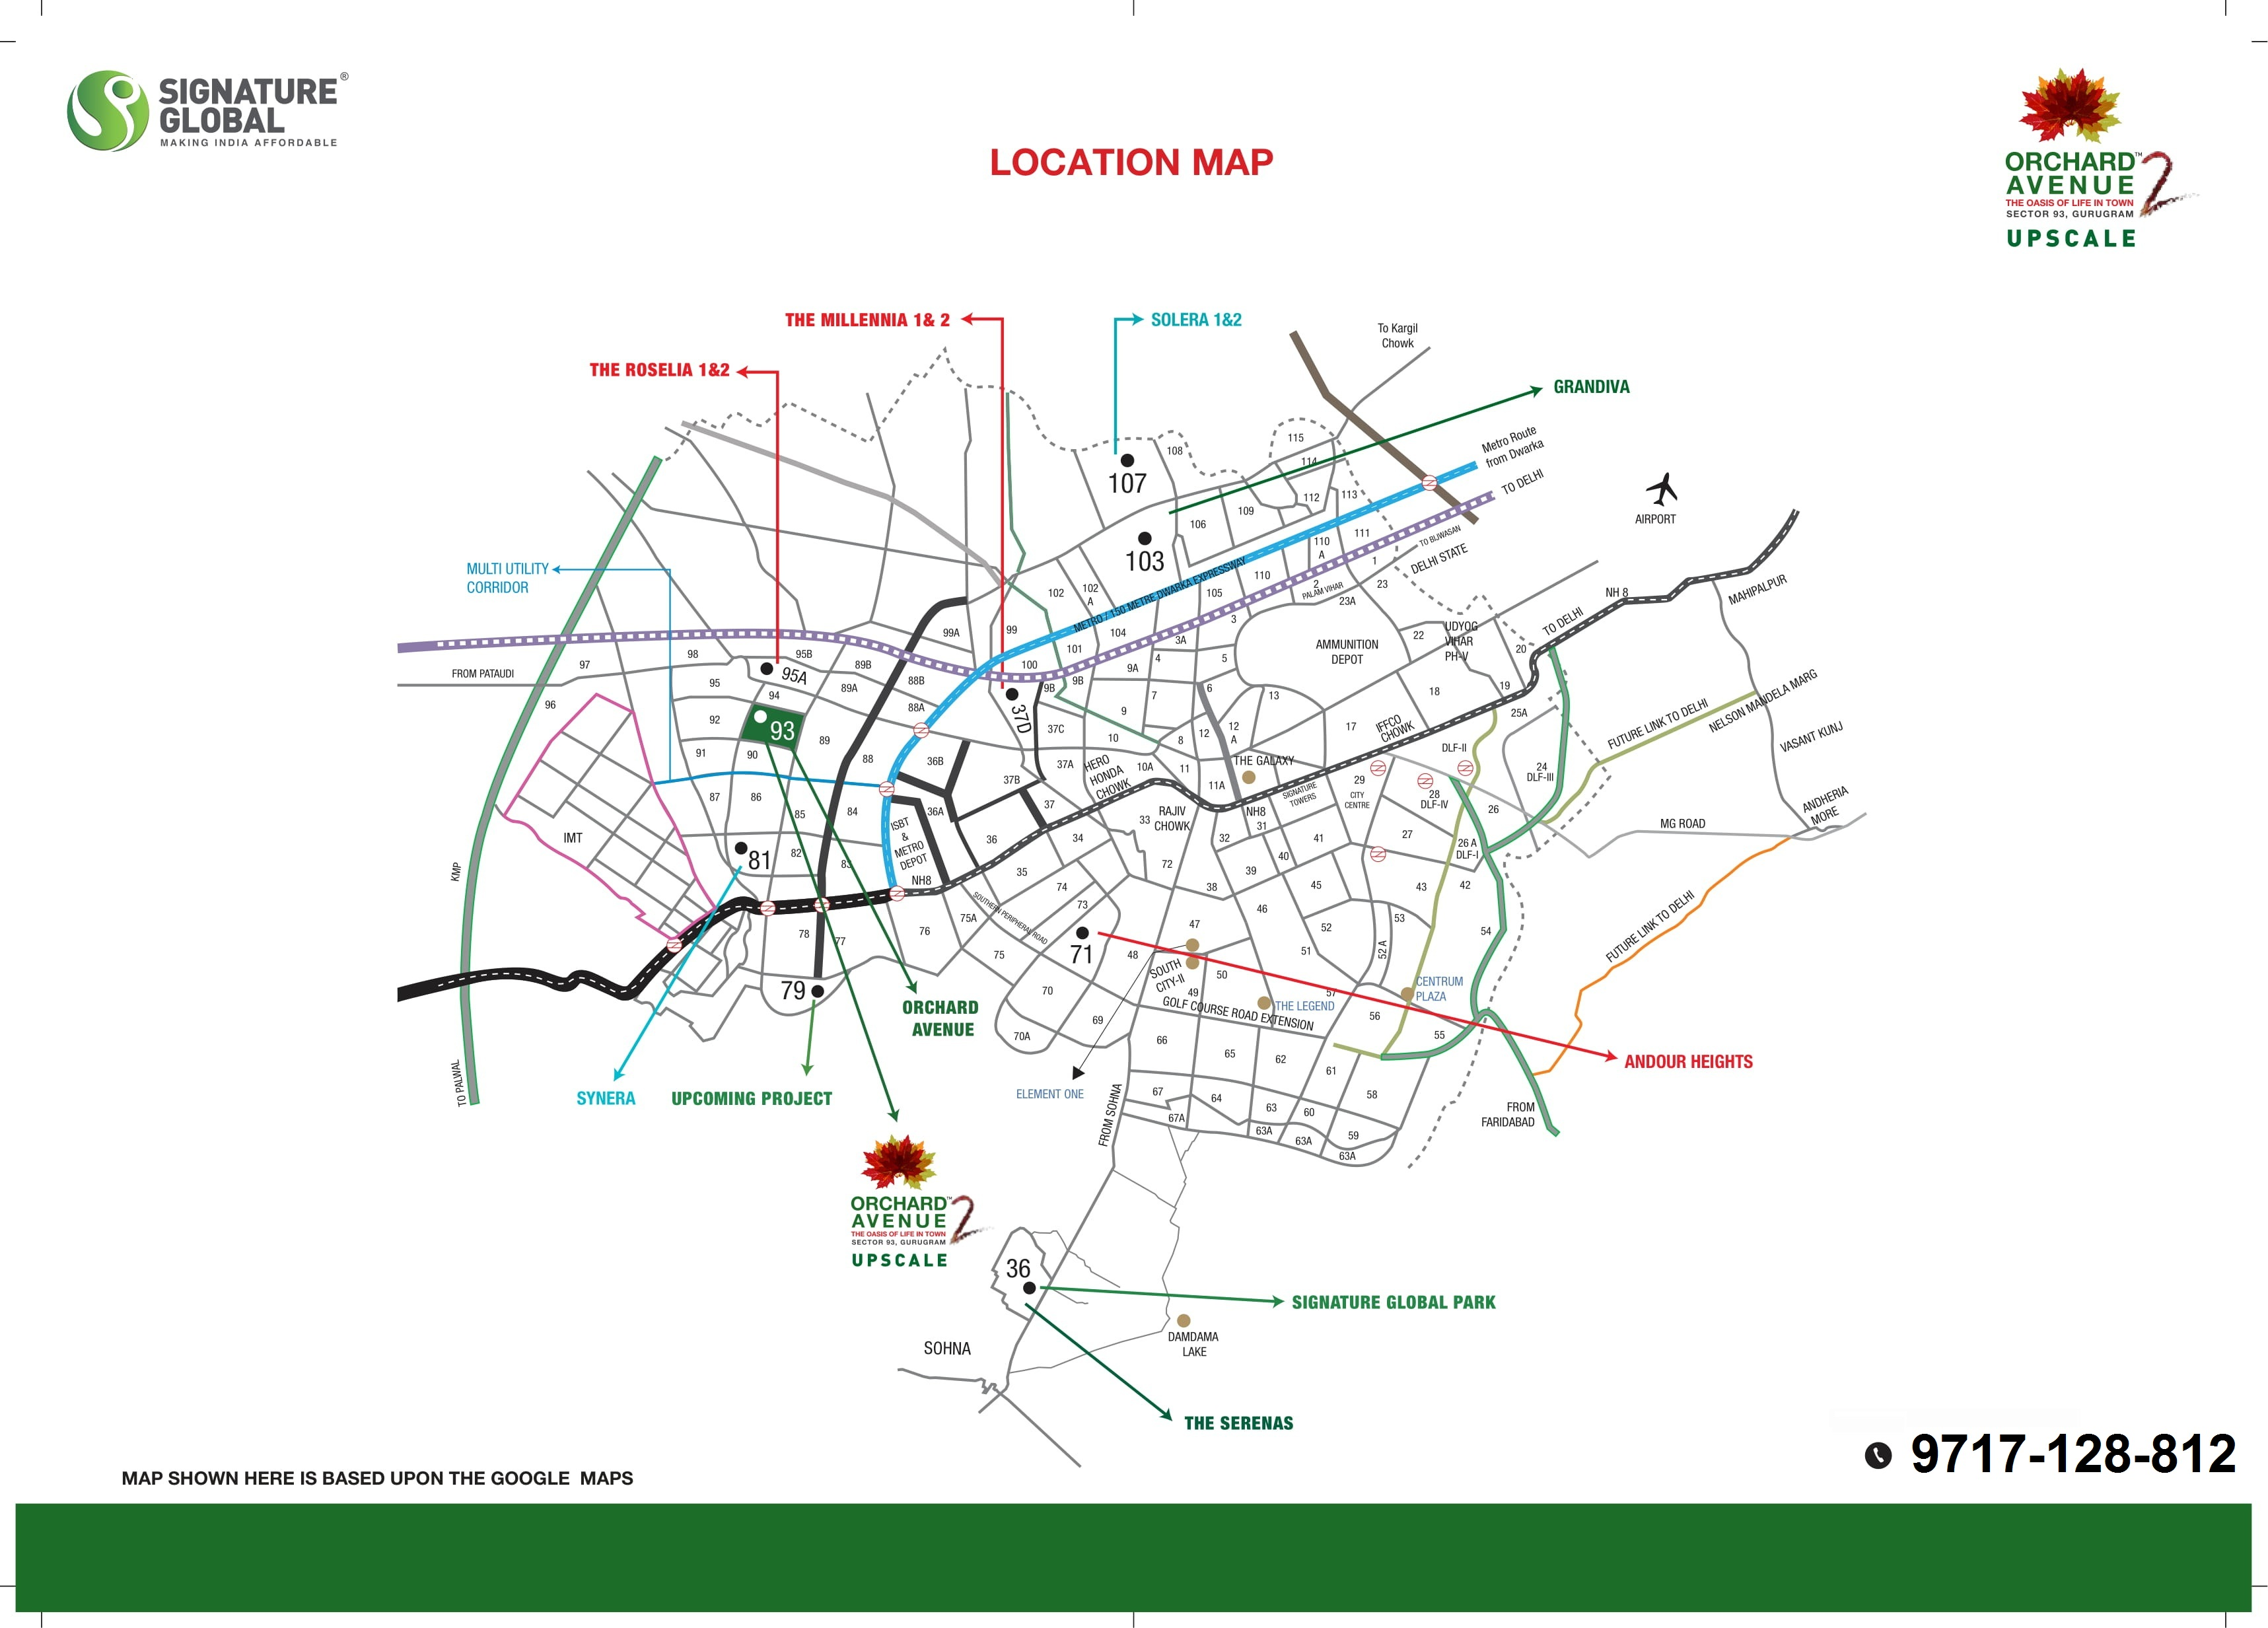 Signature Orchard Avenue 2 Layout Plan